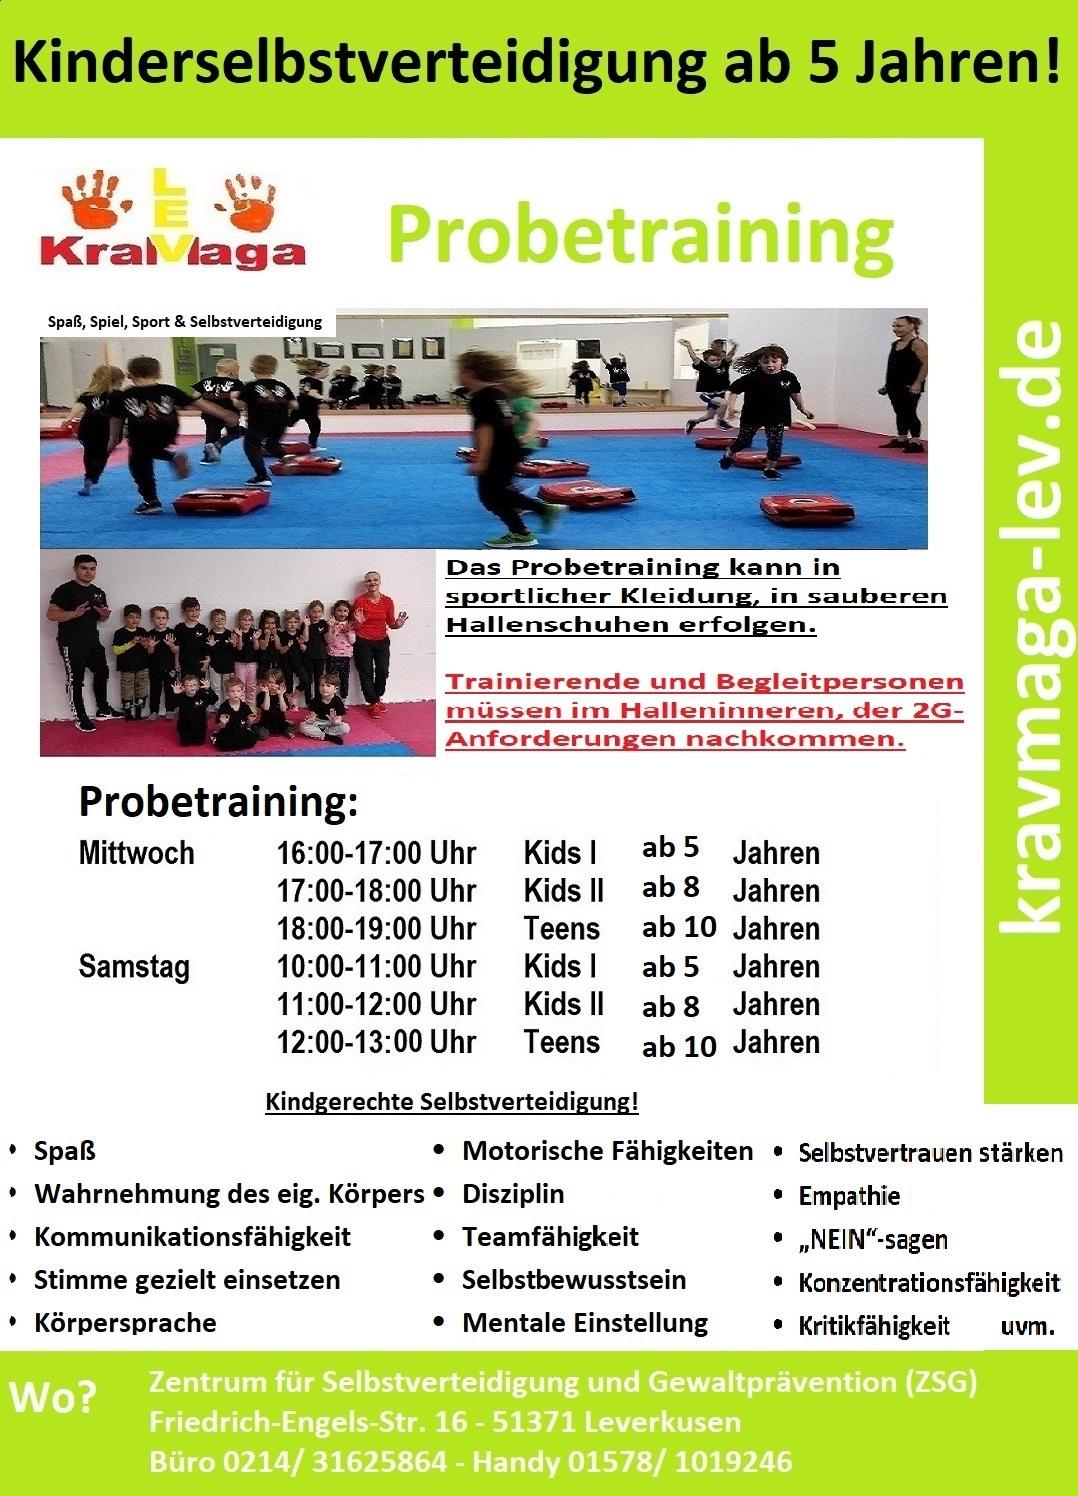 Krav Maga Leichlingen Burscheid  Krav  Maga Leverkusen Köln Selbstverteidigung you can fight Gewaltprävention Druckpunkt